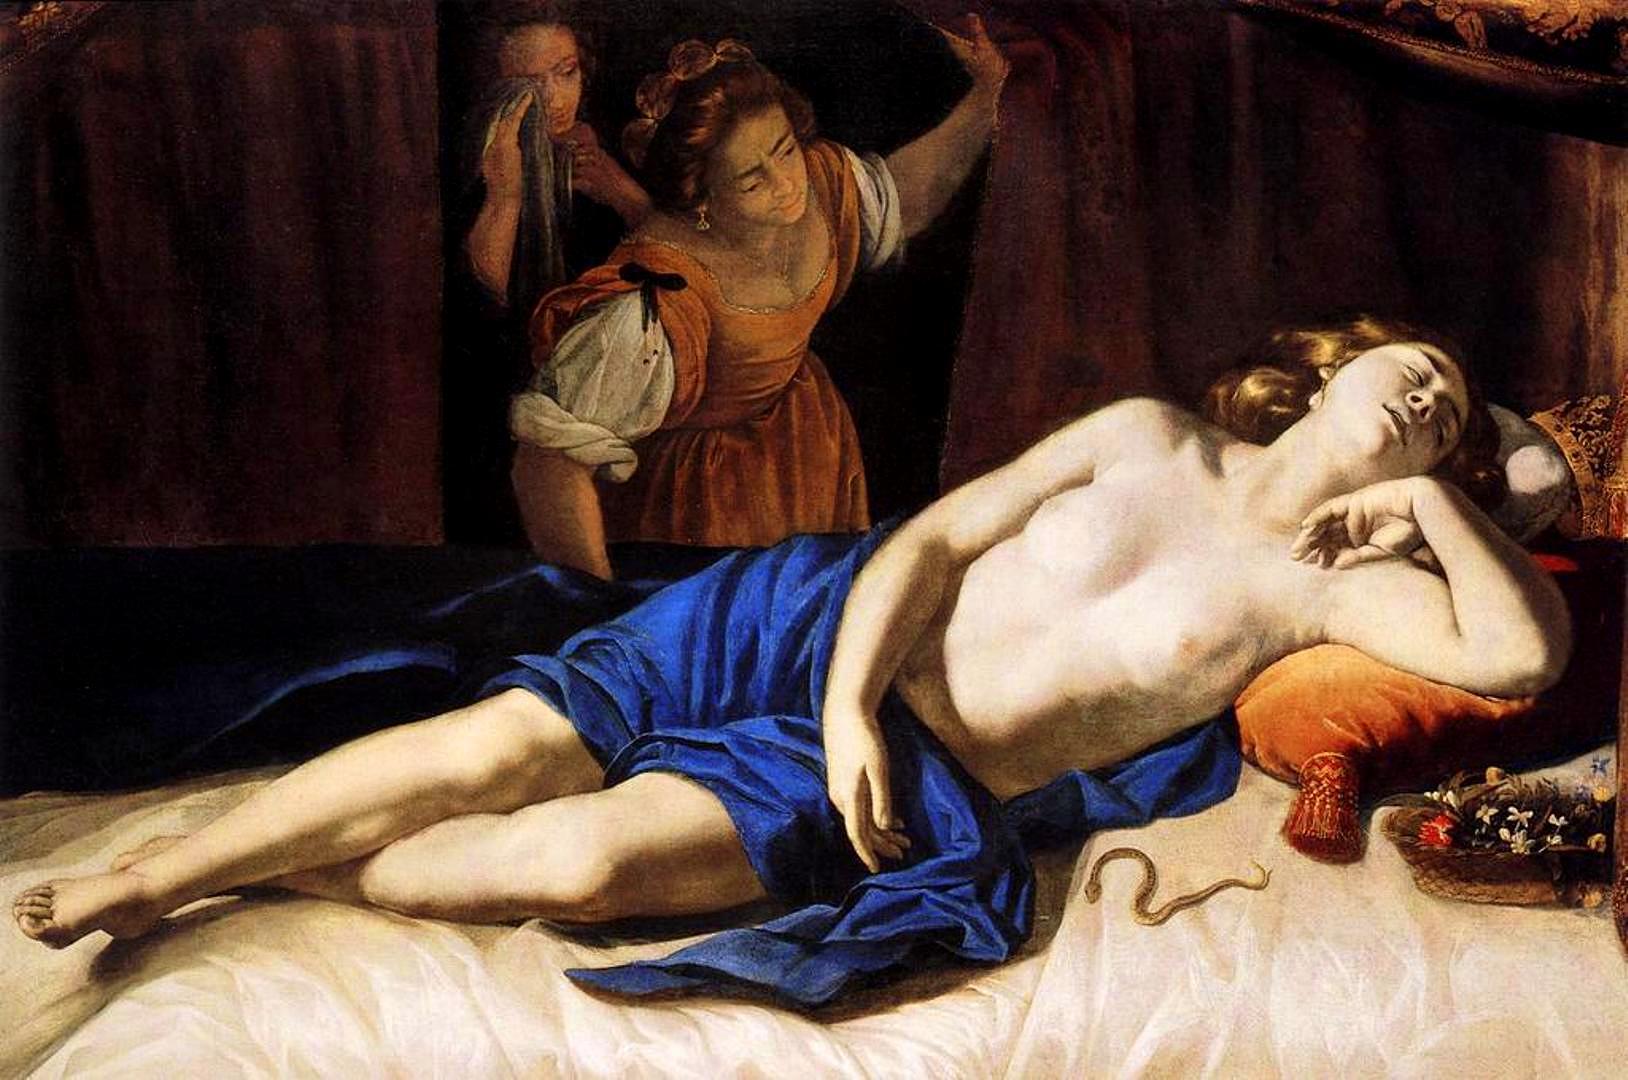 ARTEMISIA La mort de Cléopâtre